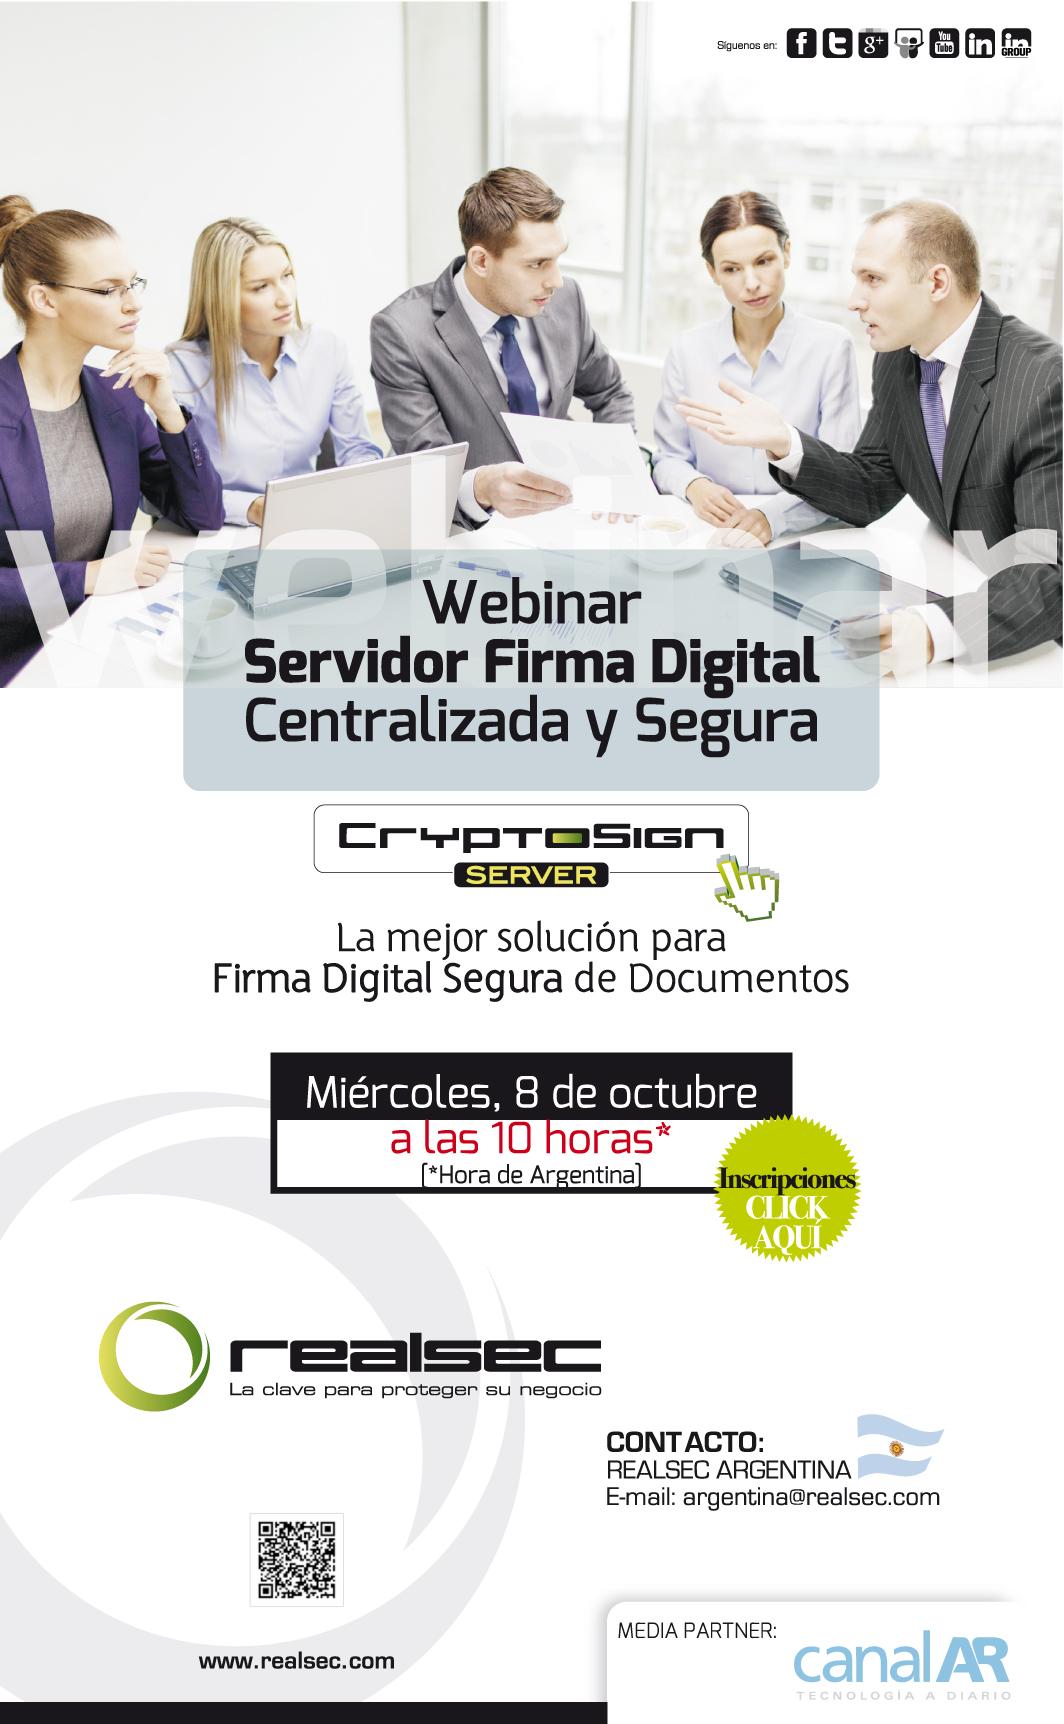 cartel-webinar-argentina-firma-digital